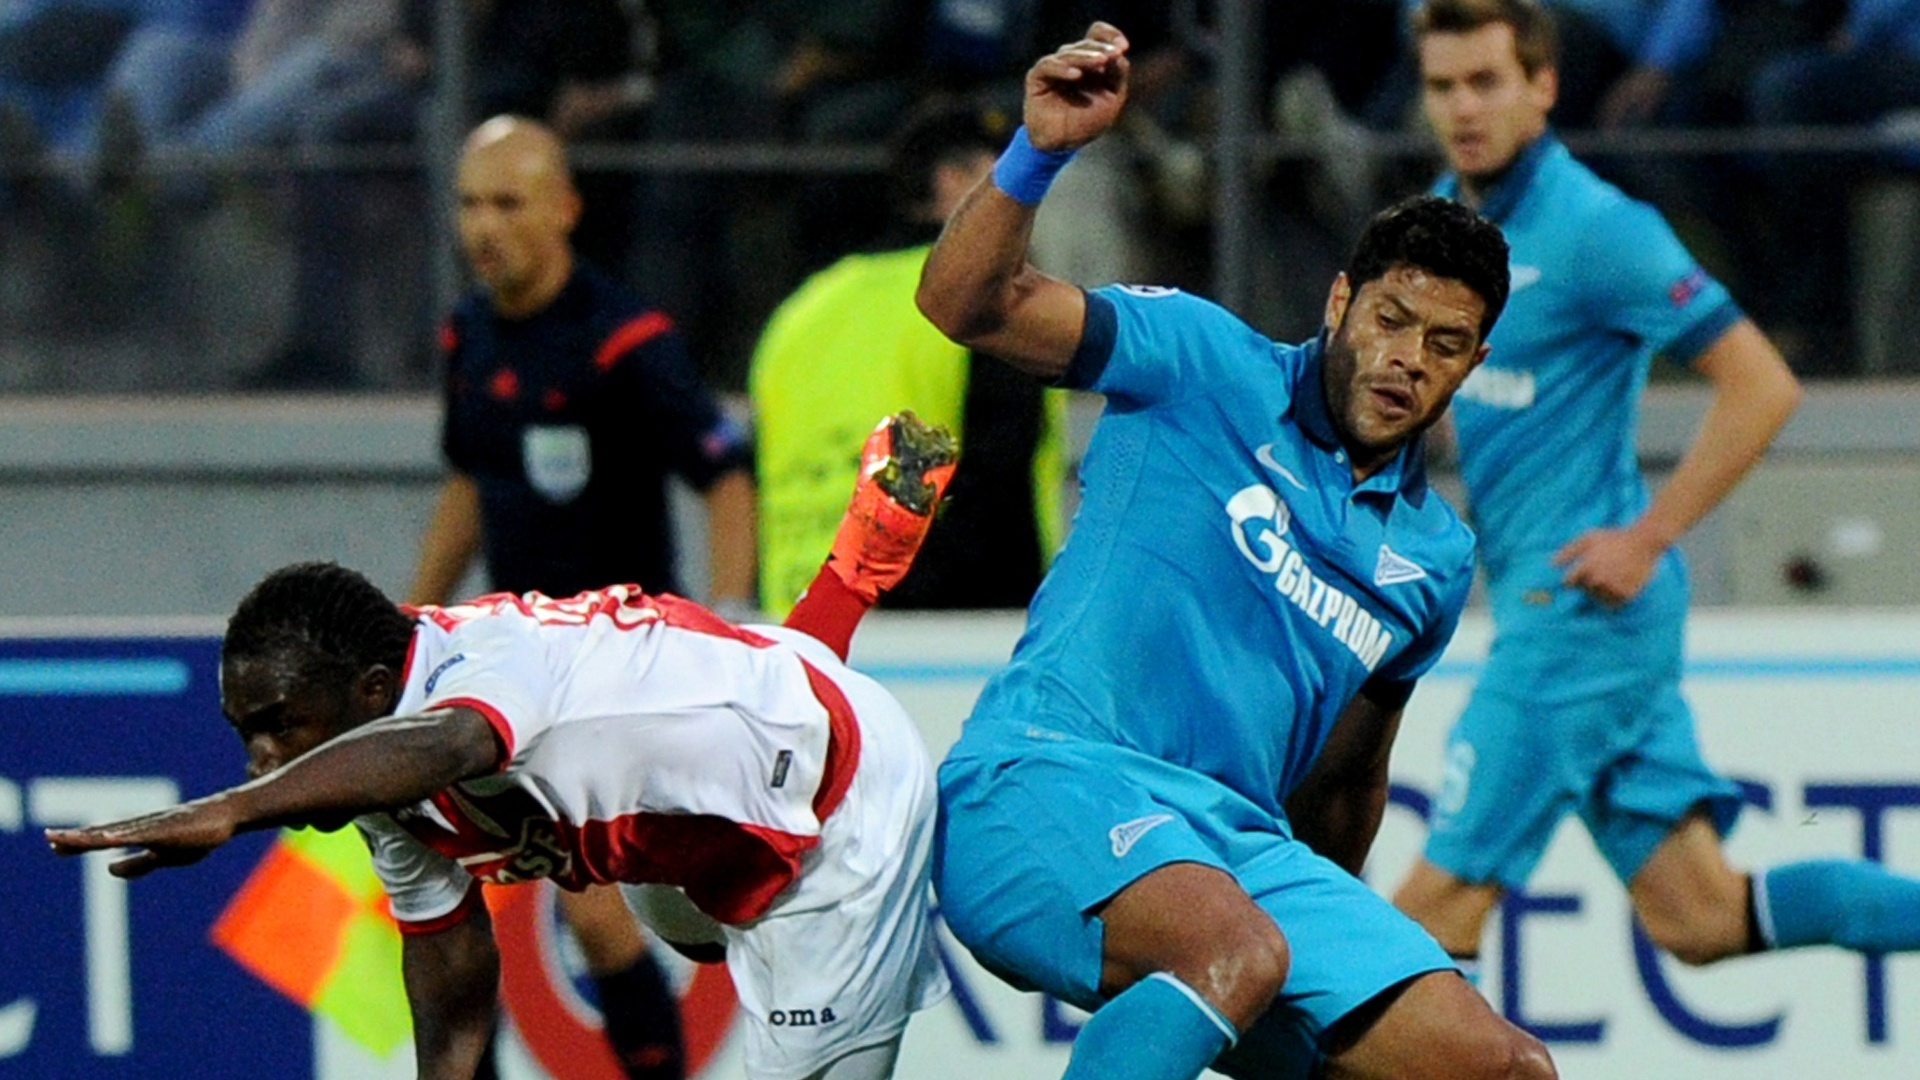 26.08.2014 - Hulk disputa bola com Jeff Louis na vitória do Zenit